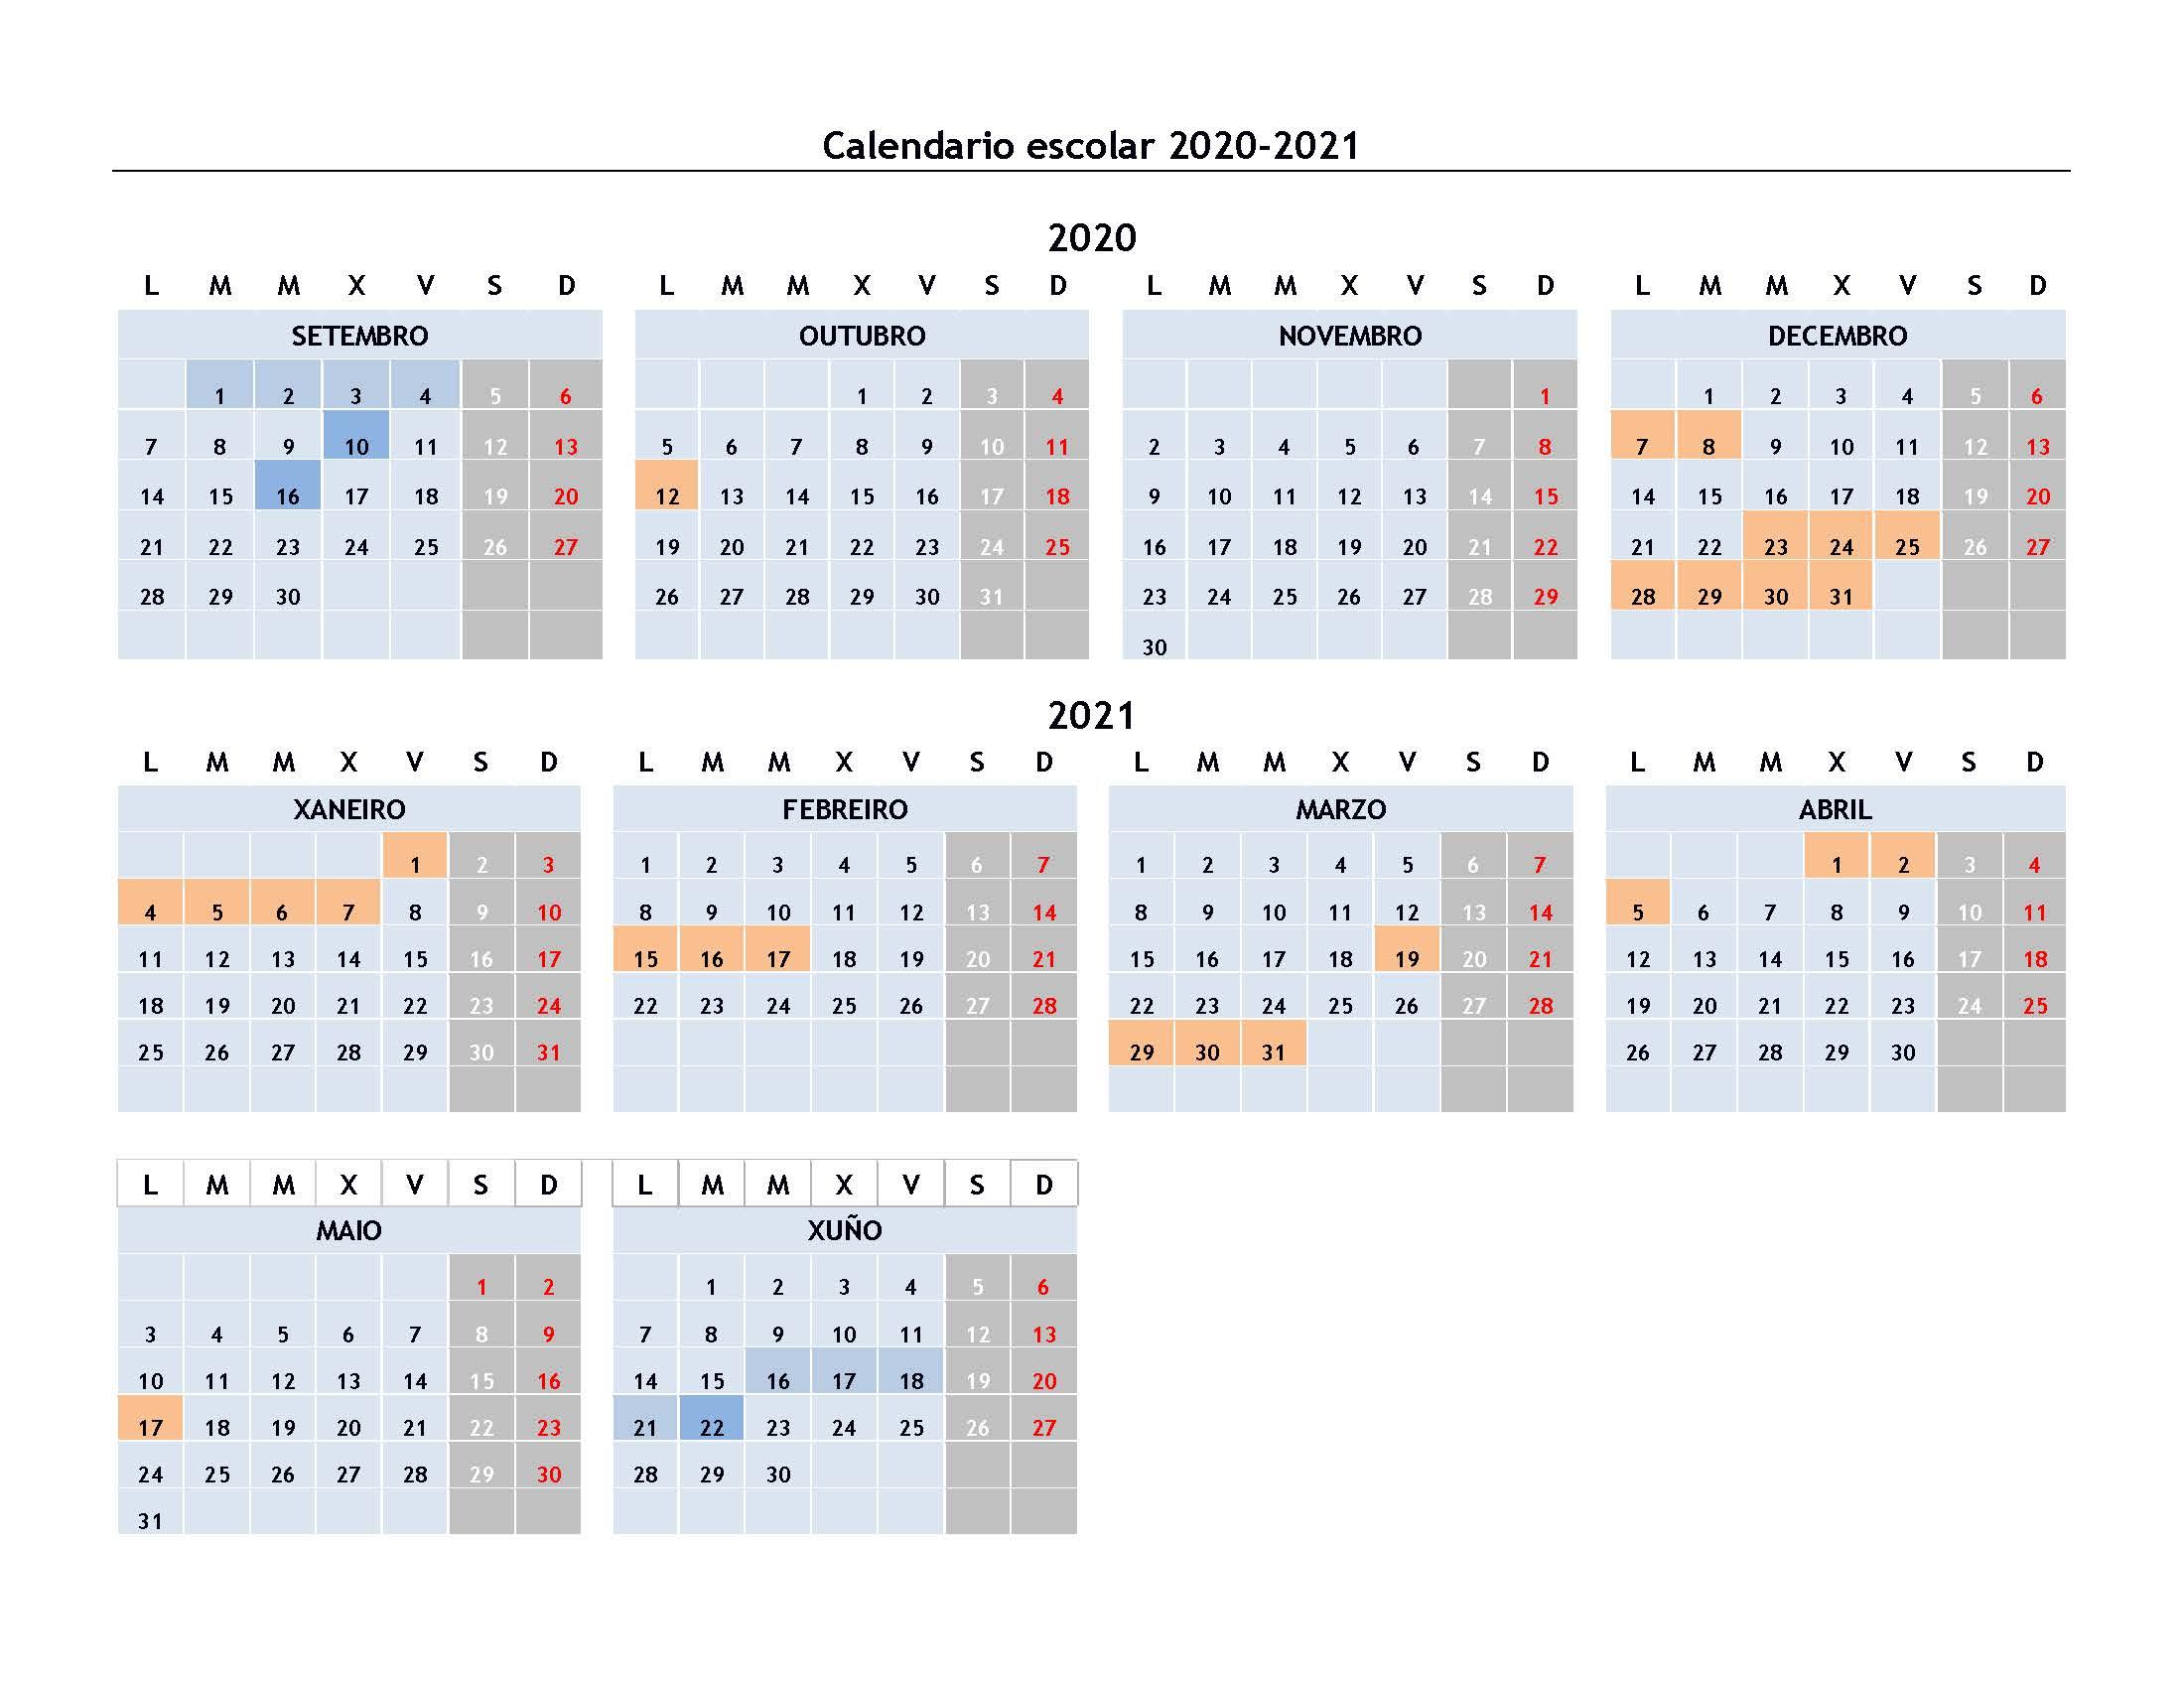 calendario_escolar20-21 (1)_Página_1